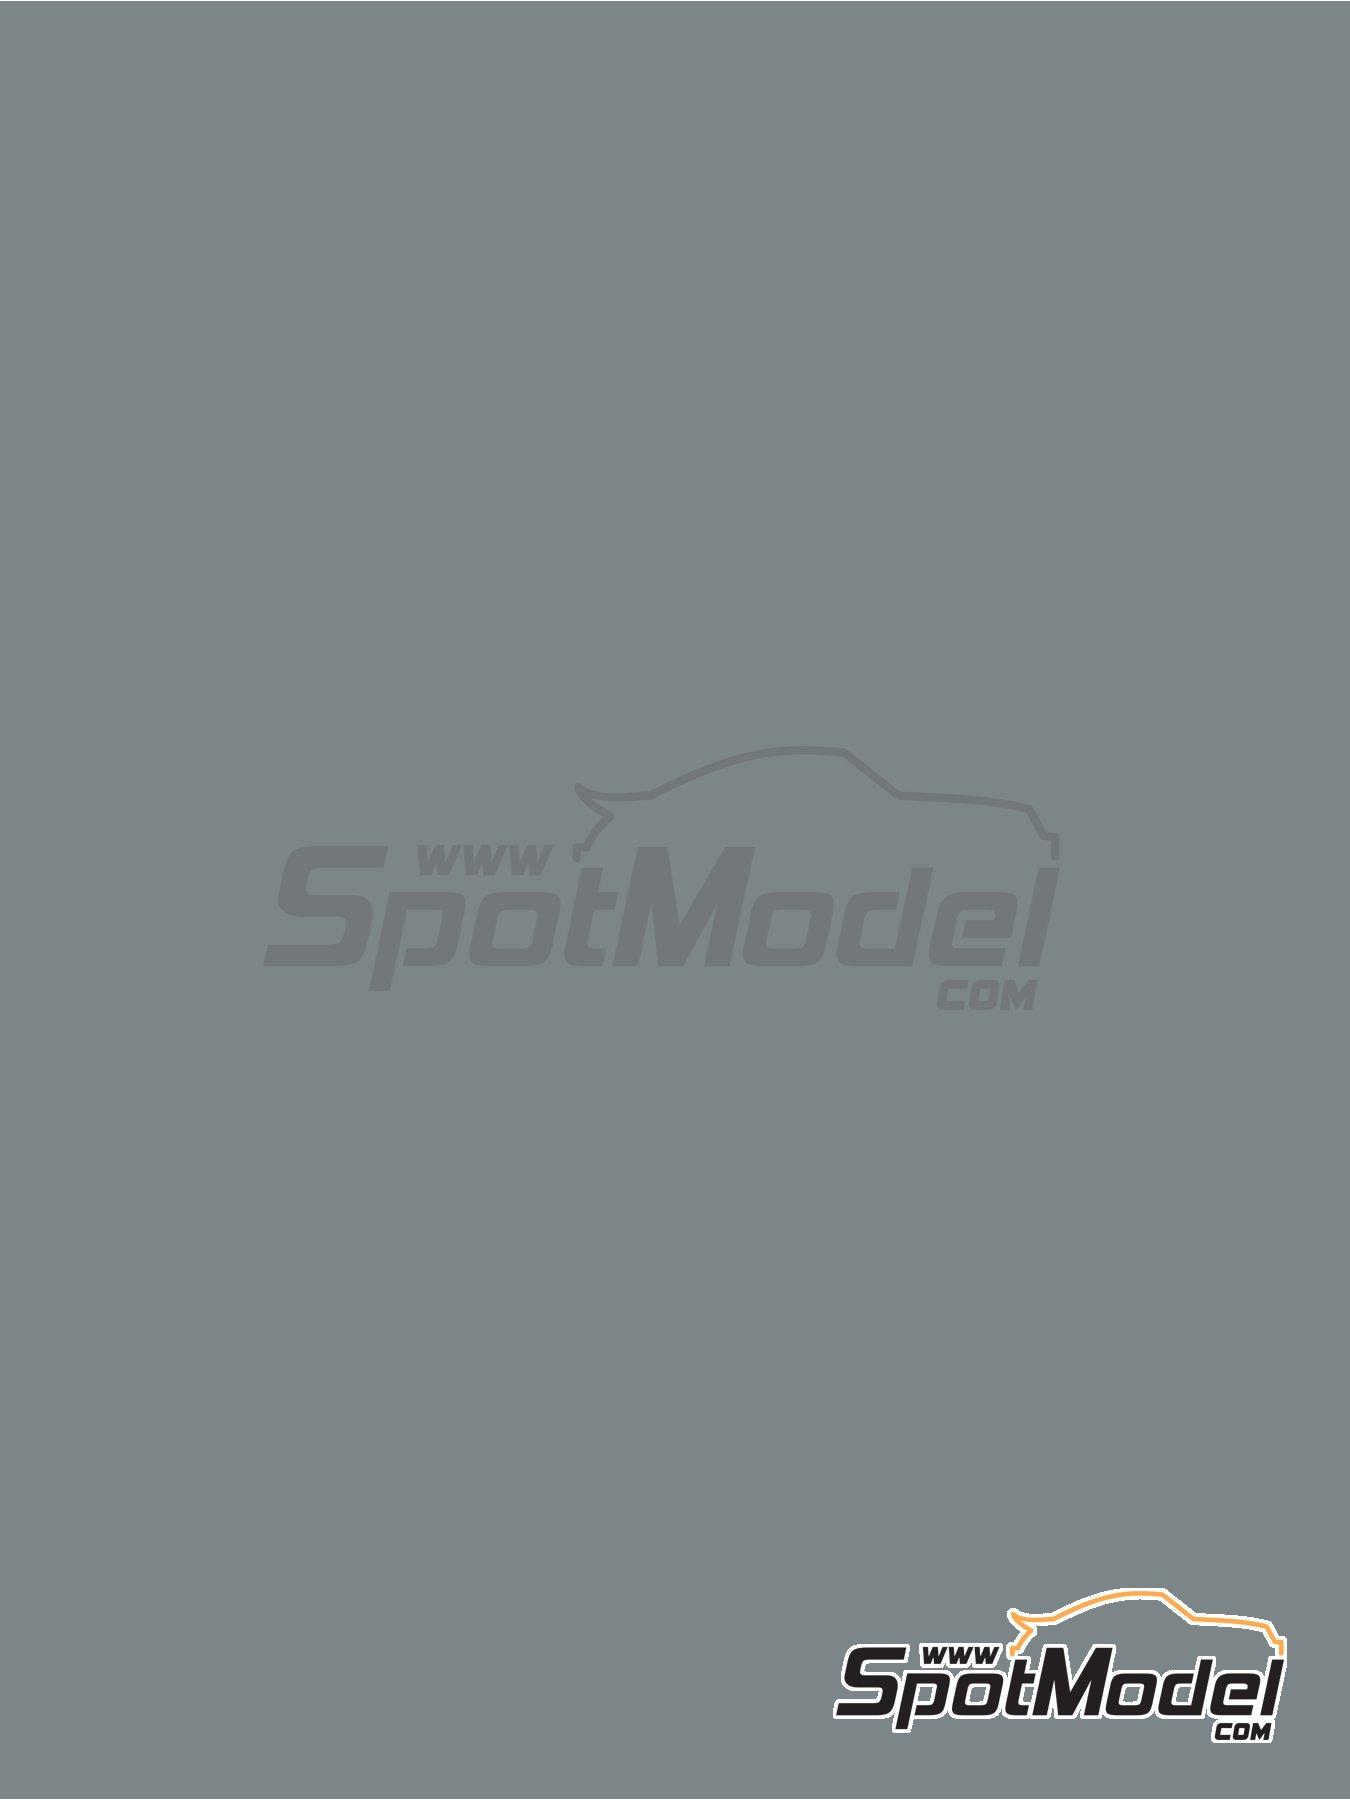 Gristele 2 - RAL7046 - Telegrey 2 - 1 x 60ml | Pintura fabricado por Zero Paints (ref.ZP-1033-RAL7046) image